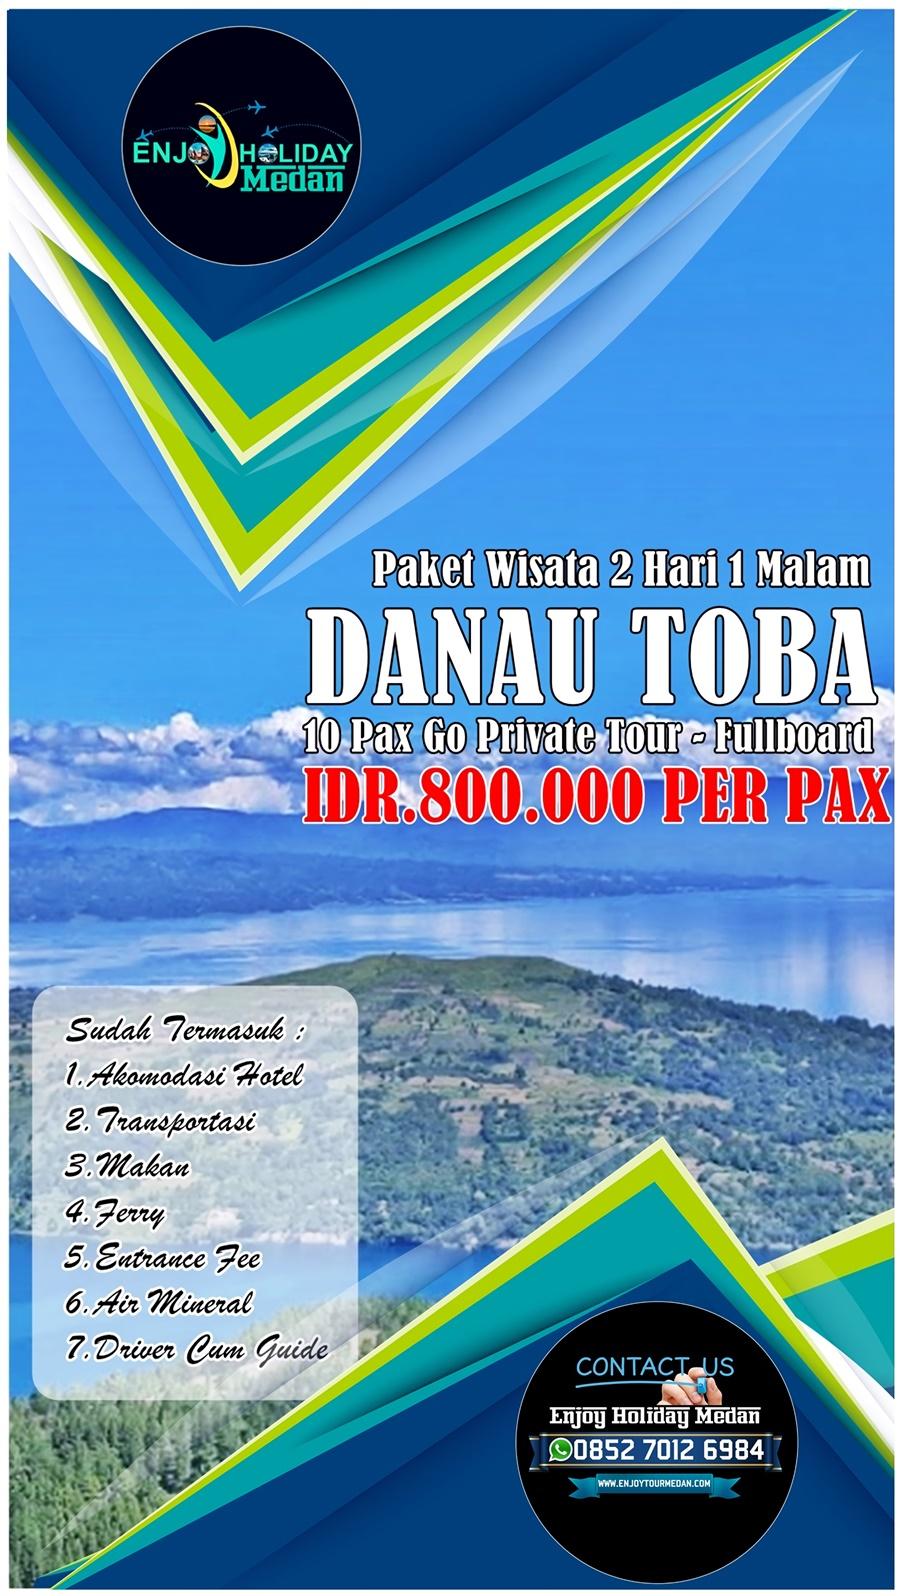 Paket Liburan Danau Toba